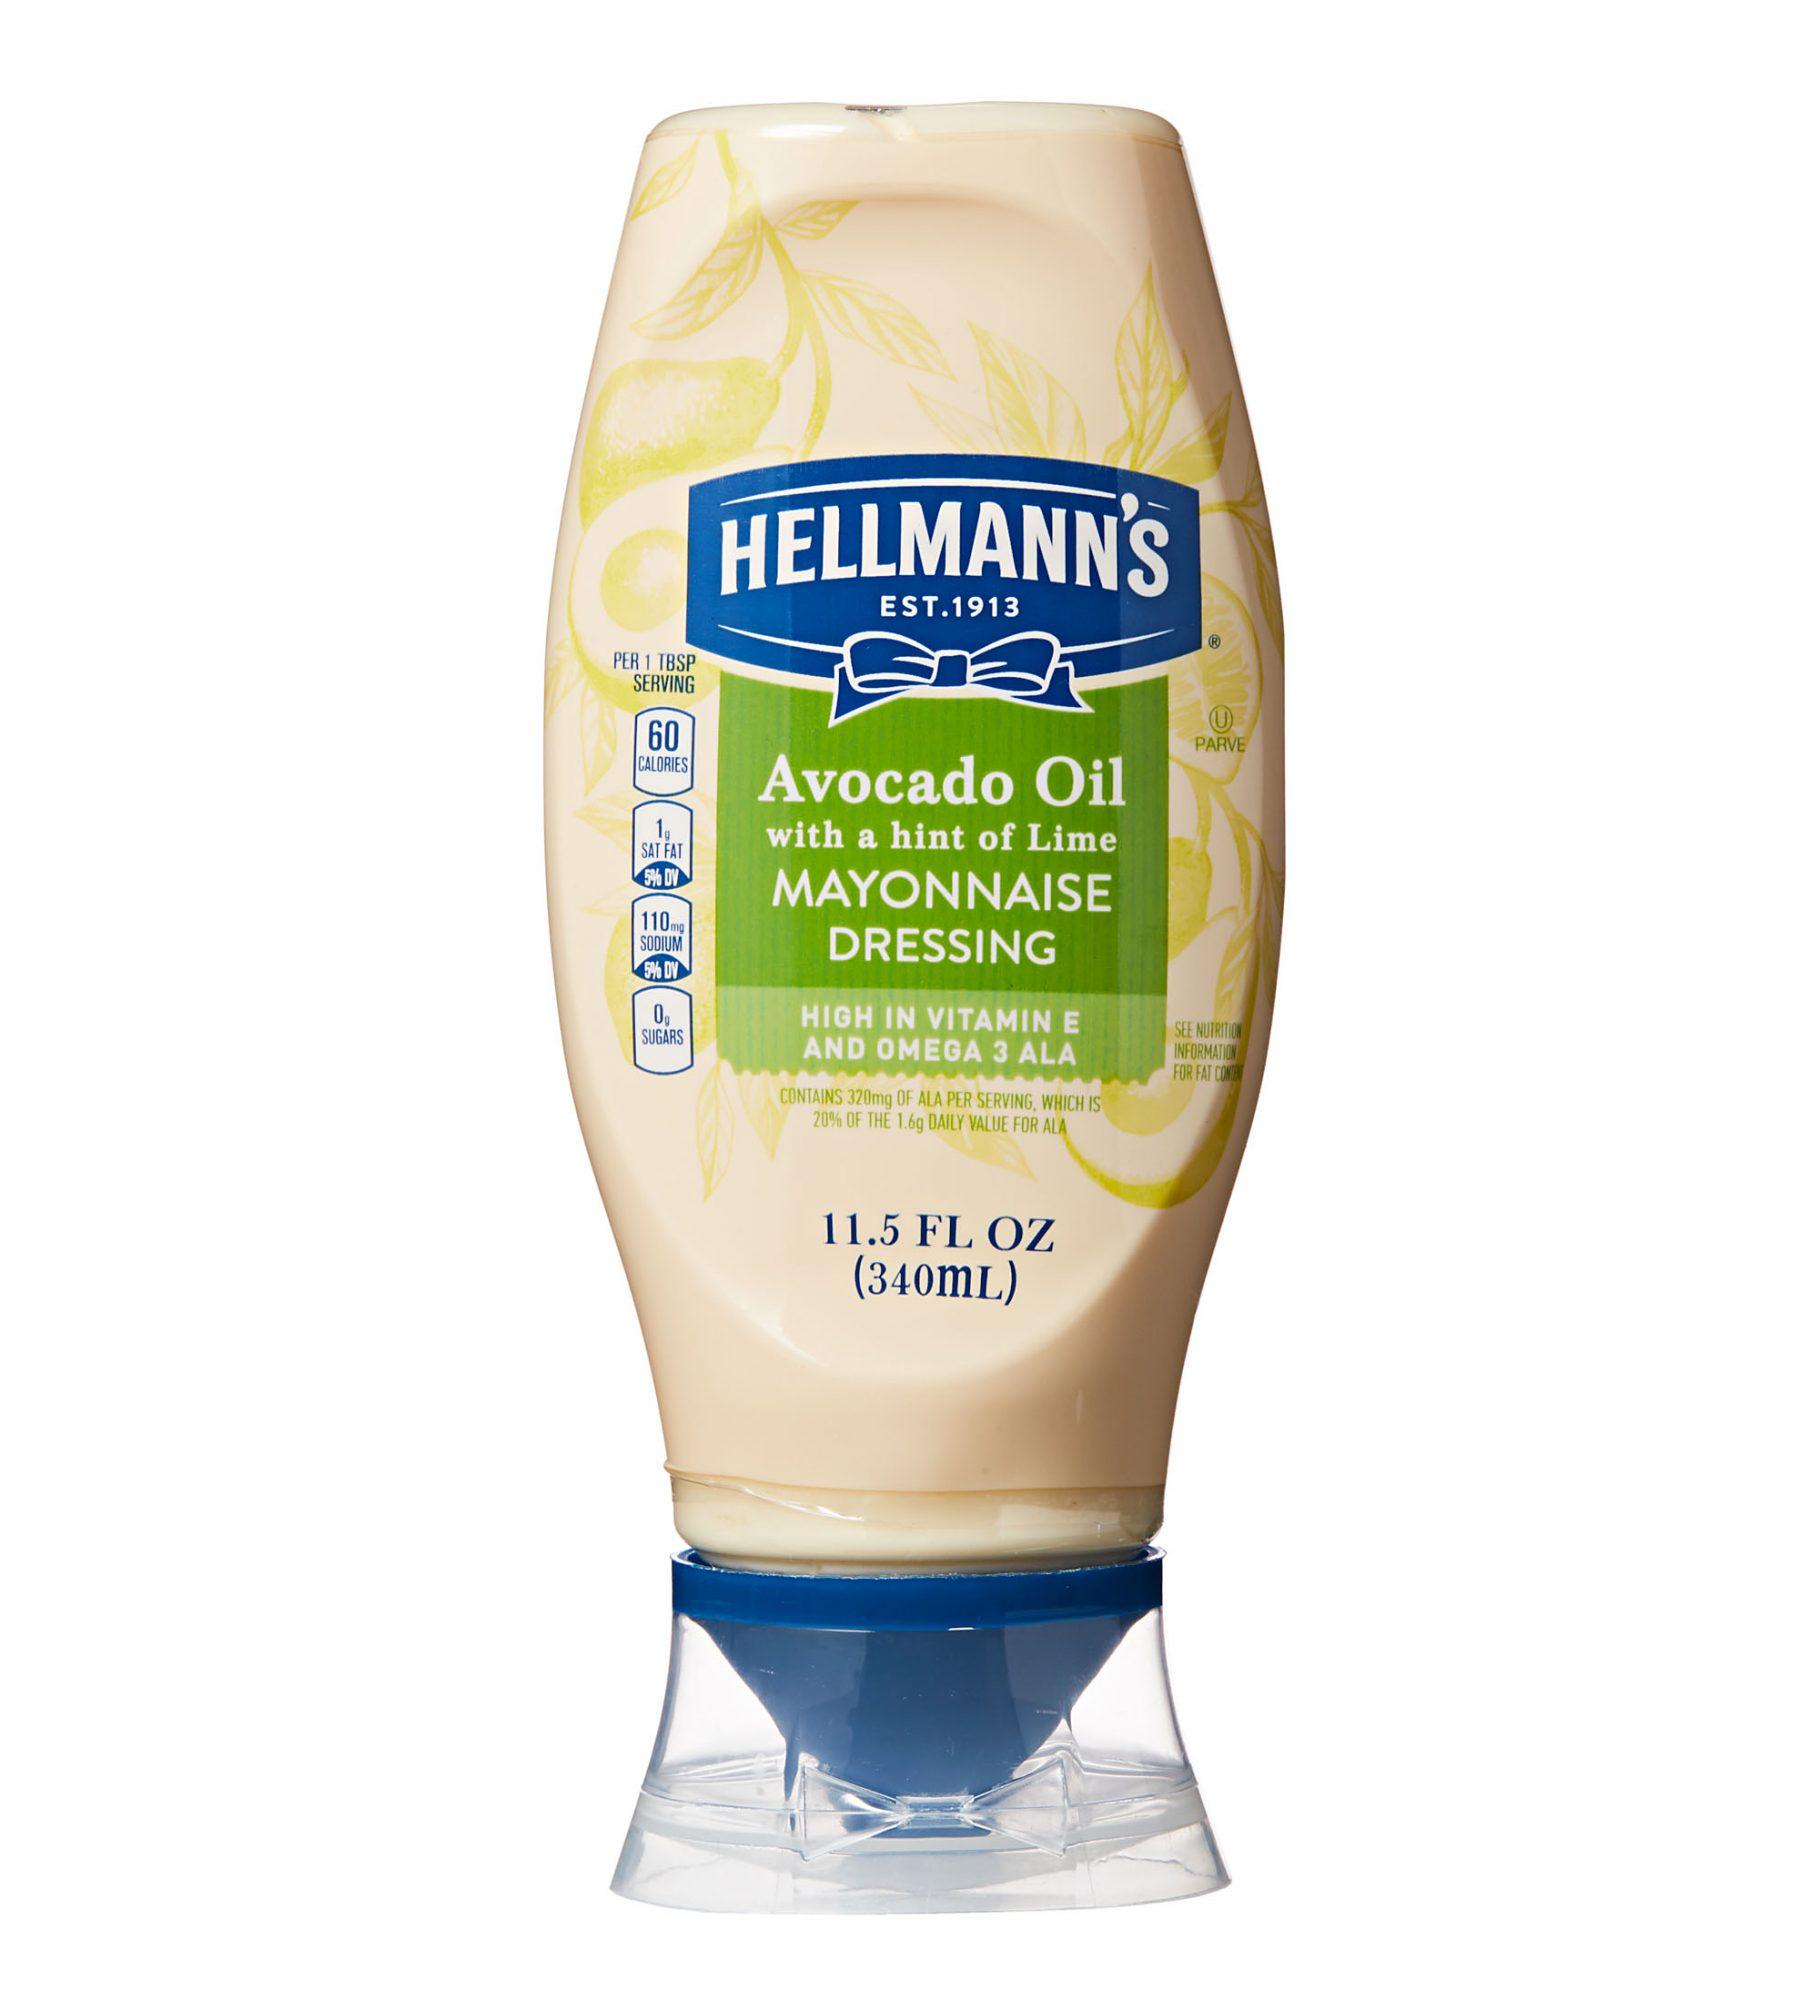 hellmann's avocado oil with hint of lime mayonnaise dressing